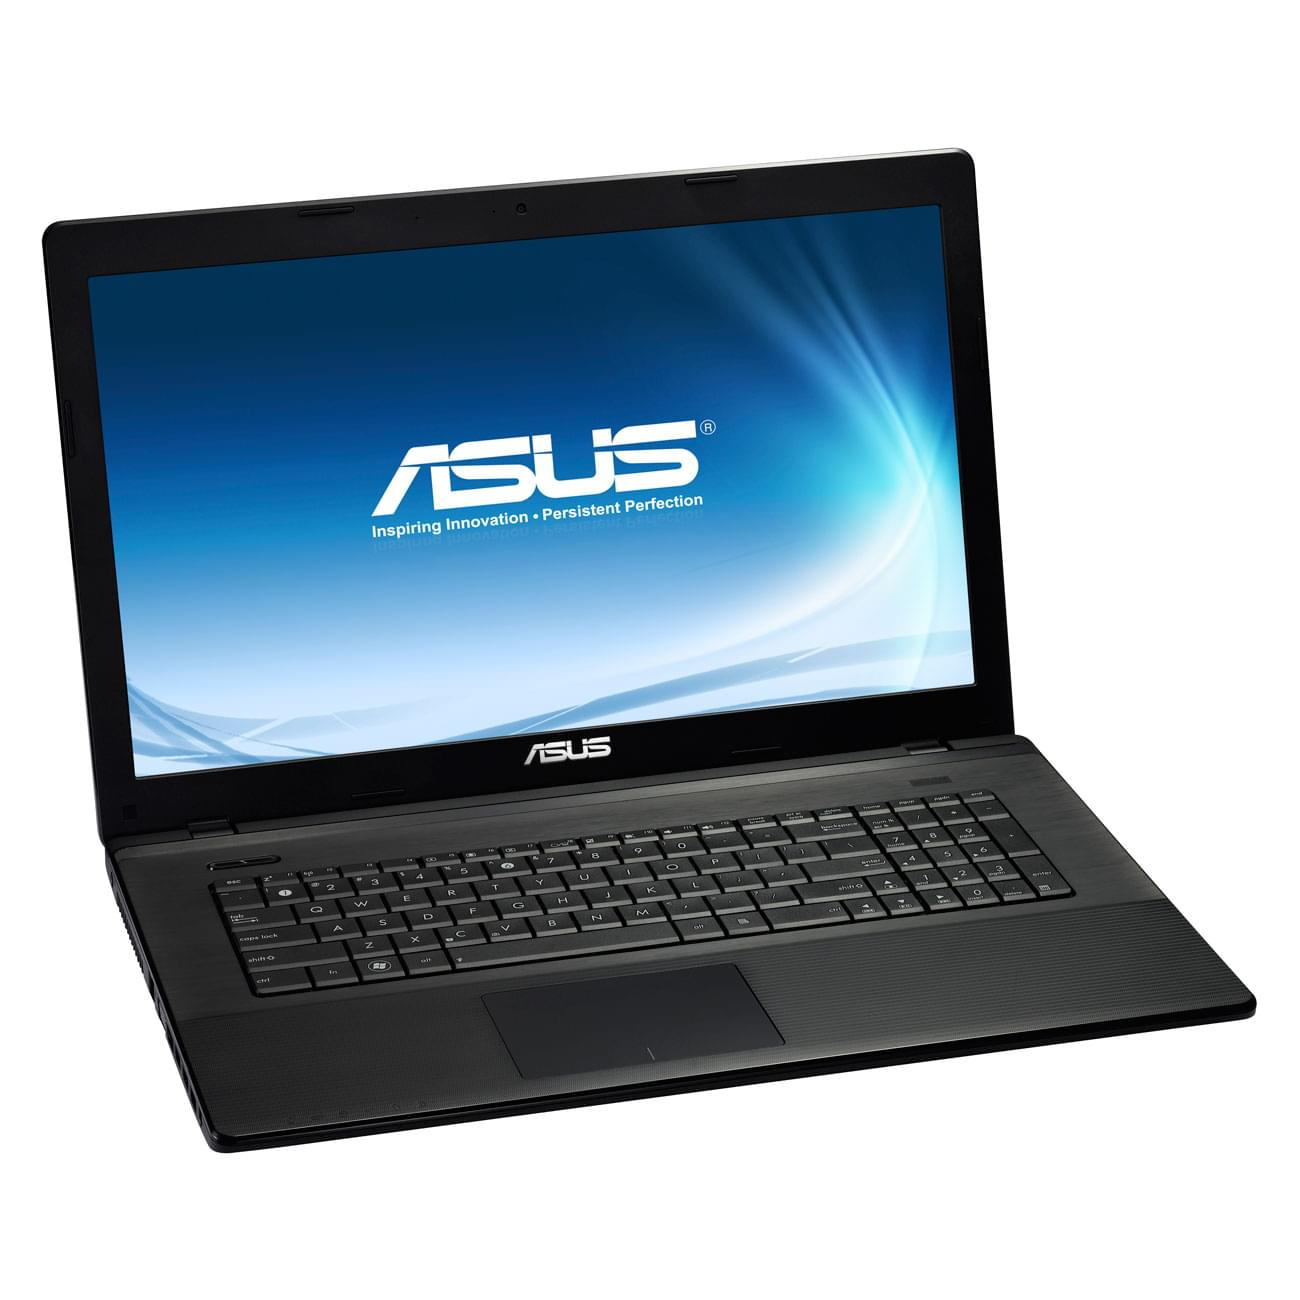 Asus X75VD-TY074V (X75VD-TY074V) - Achat / Vente PC Portable sur Cybertek.fr - 0